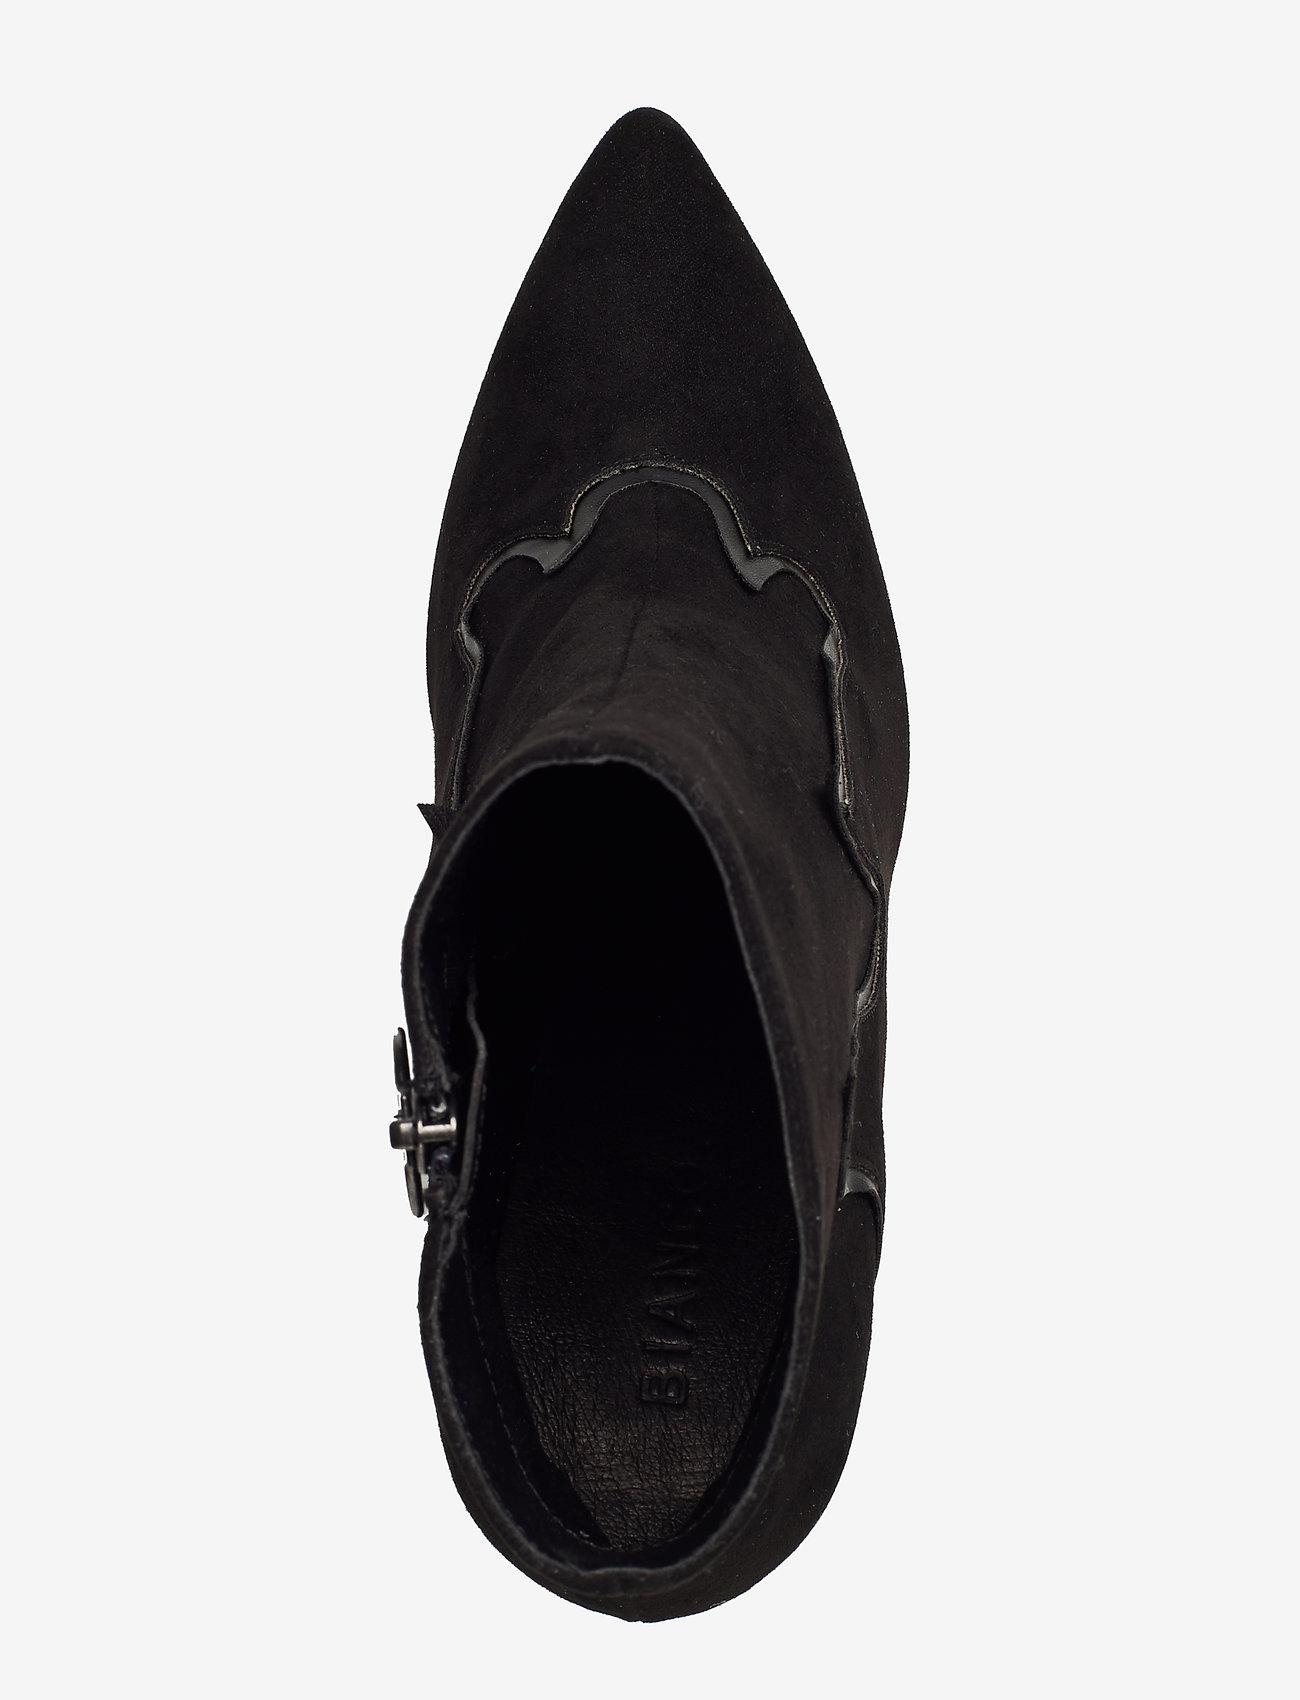 Biabernice Flame Boot (Black 1) (179.99 kr) - Bianco